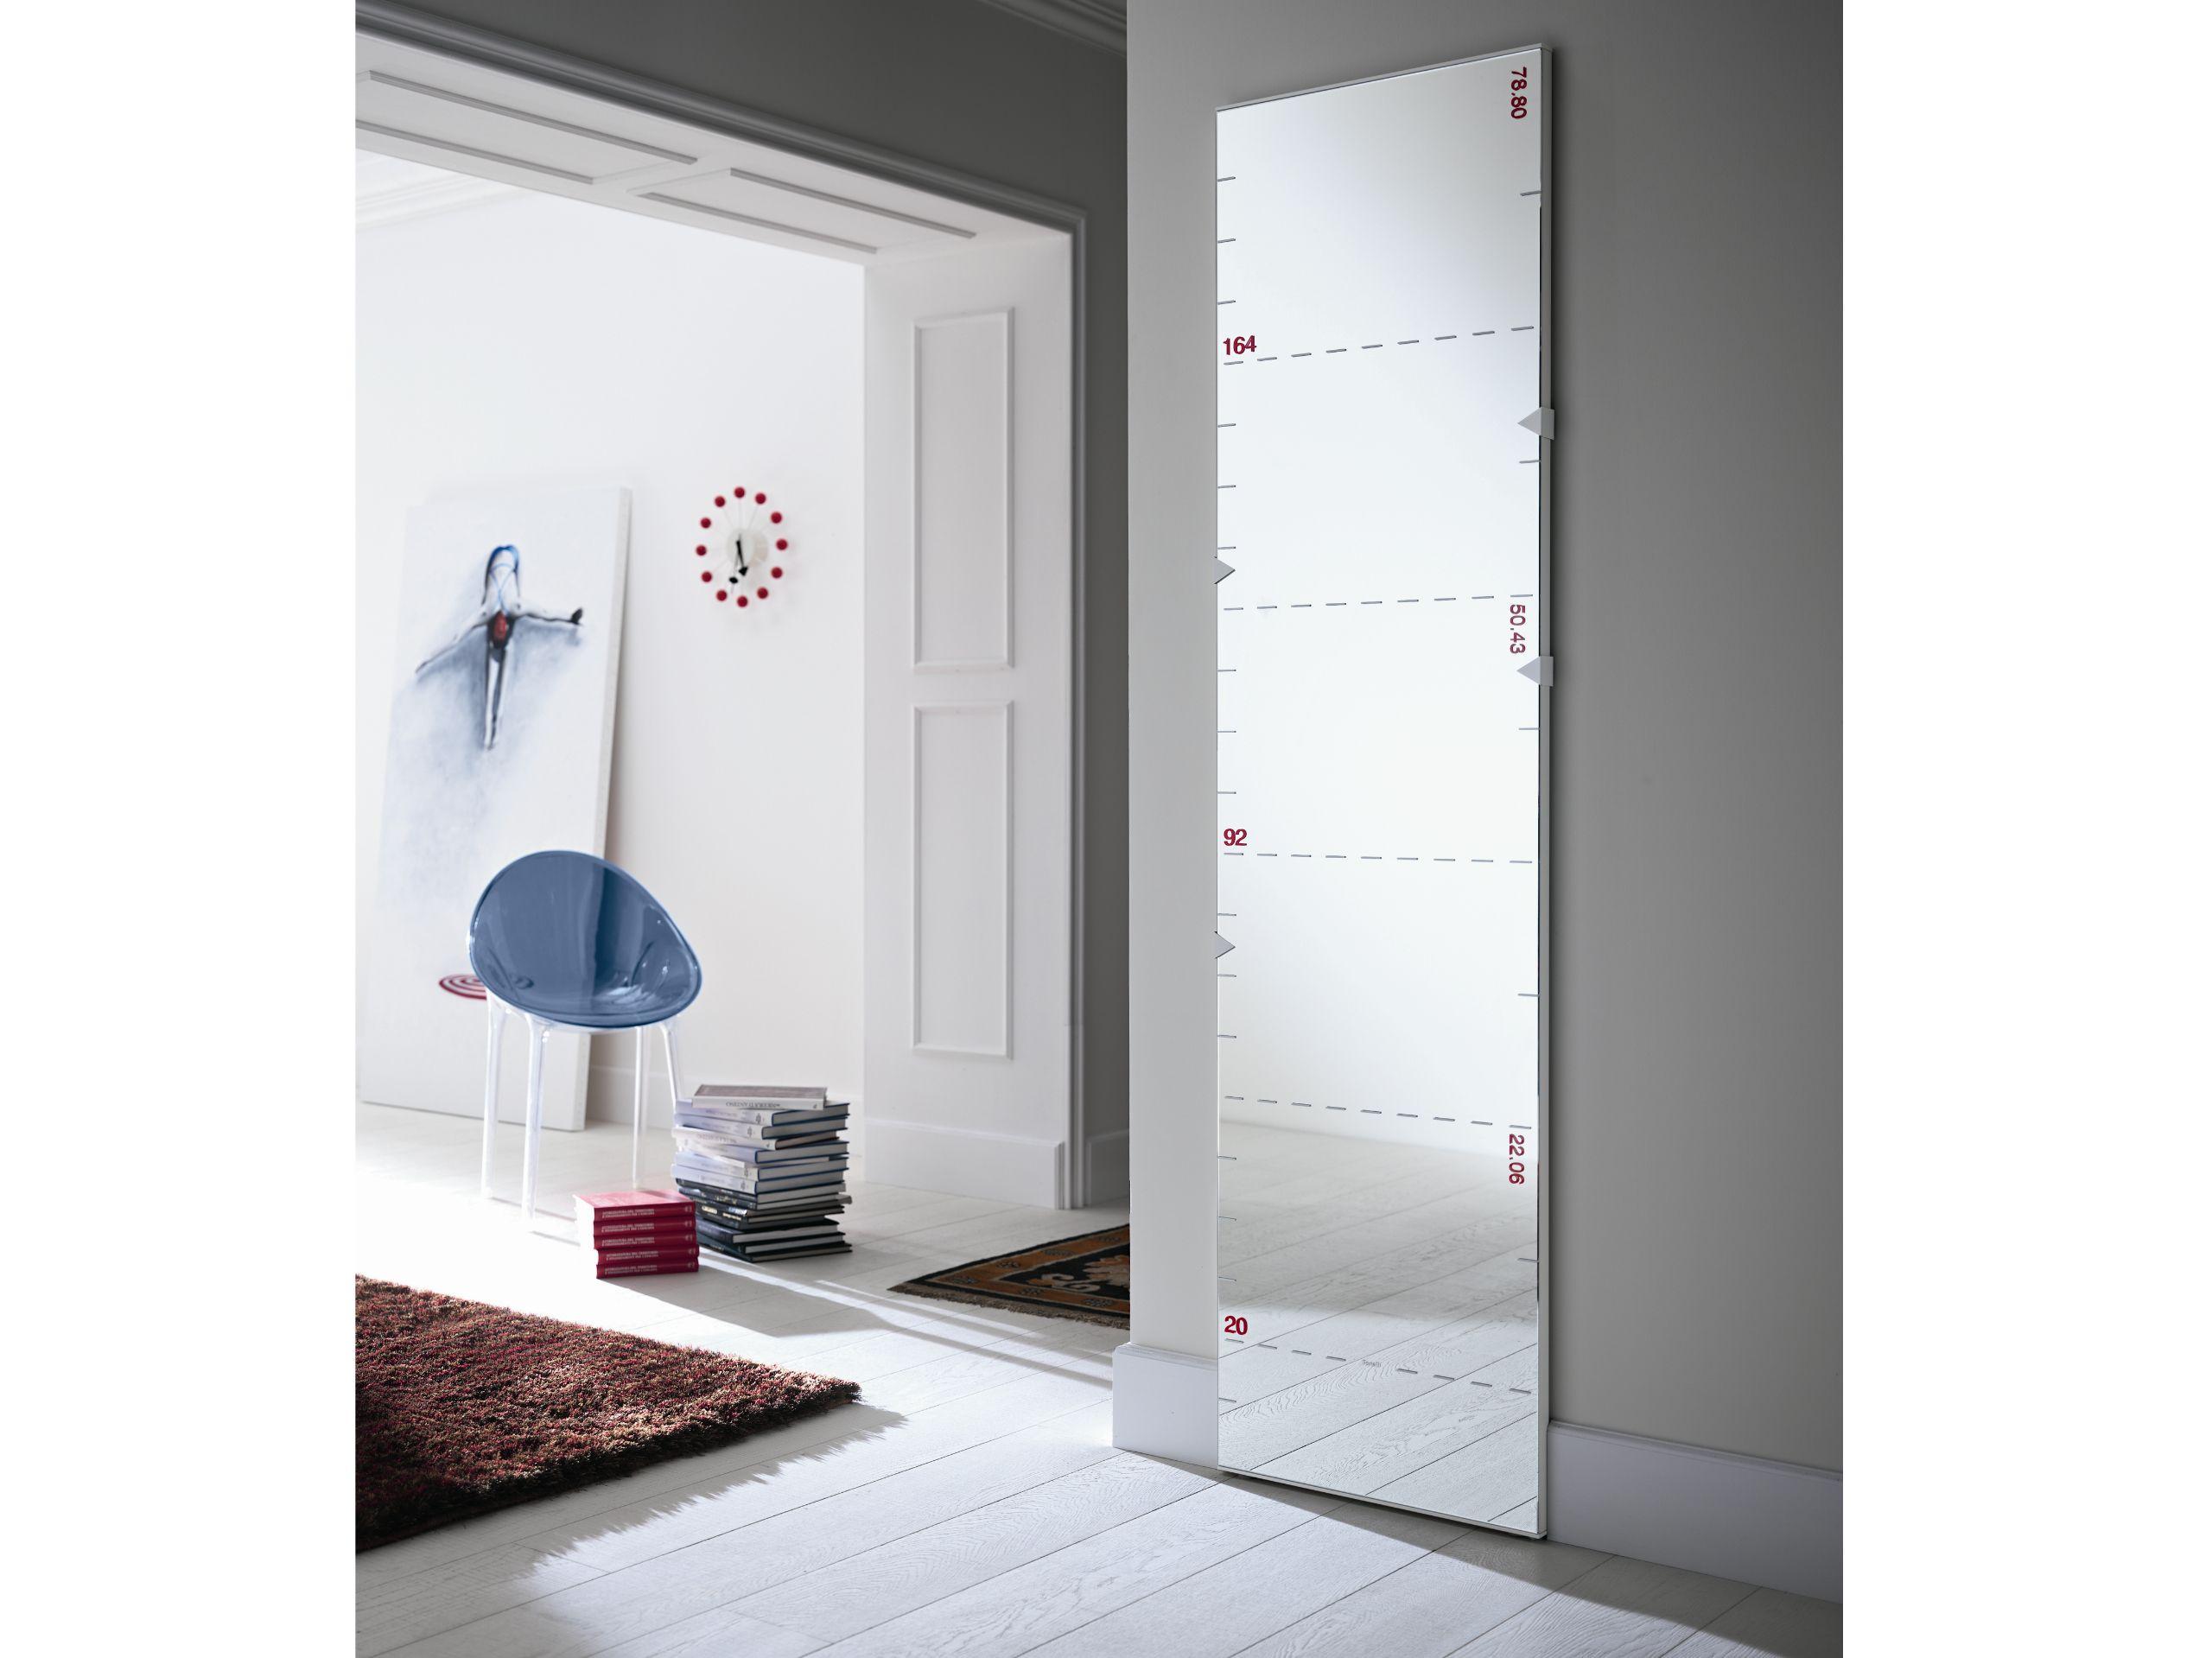 Espejo rectangular de pared righello by t d tonelli for Espejo rectangular pared